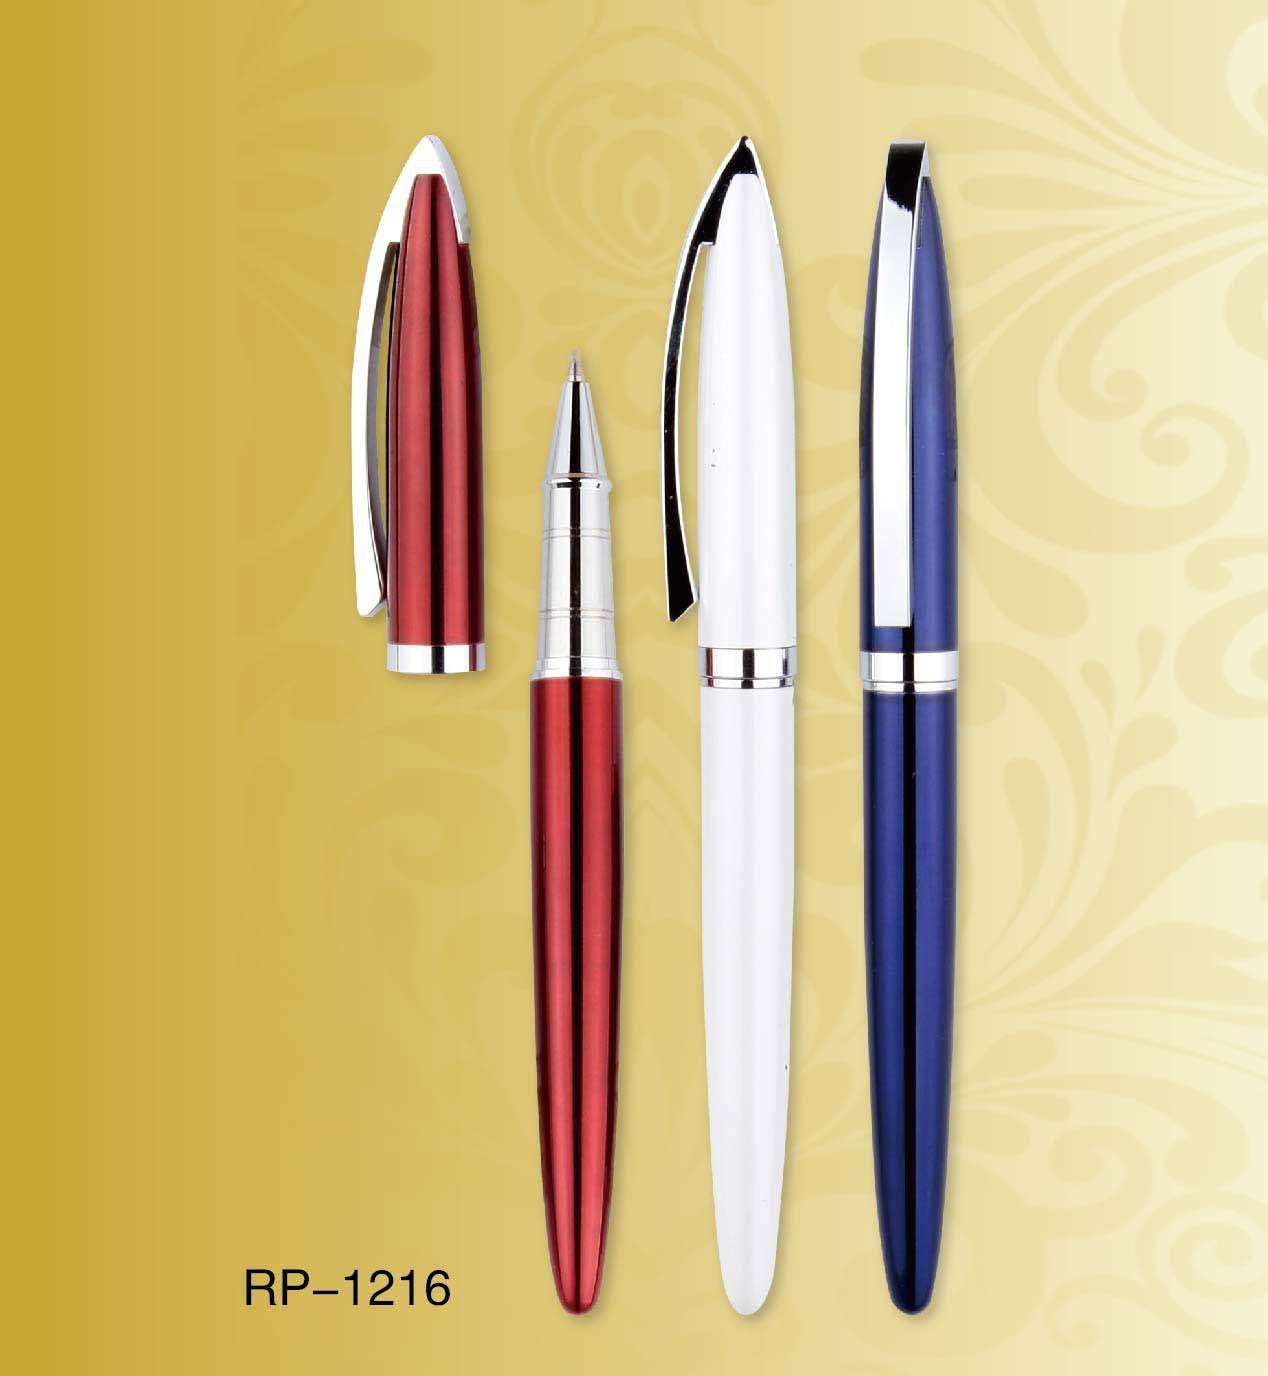 RP-1216 (2)